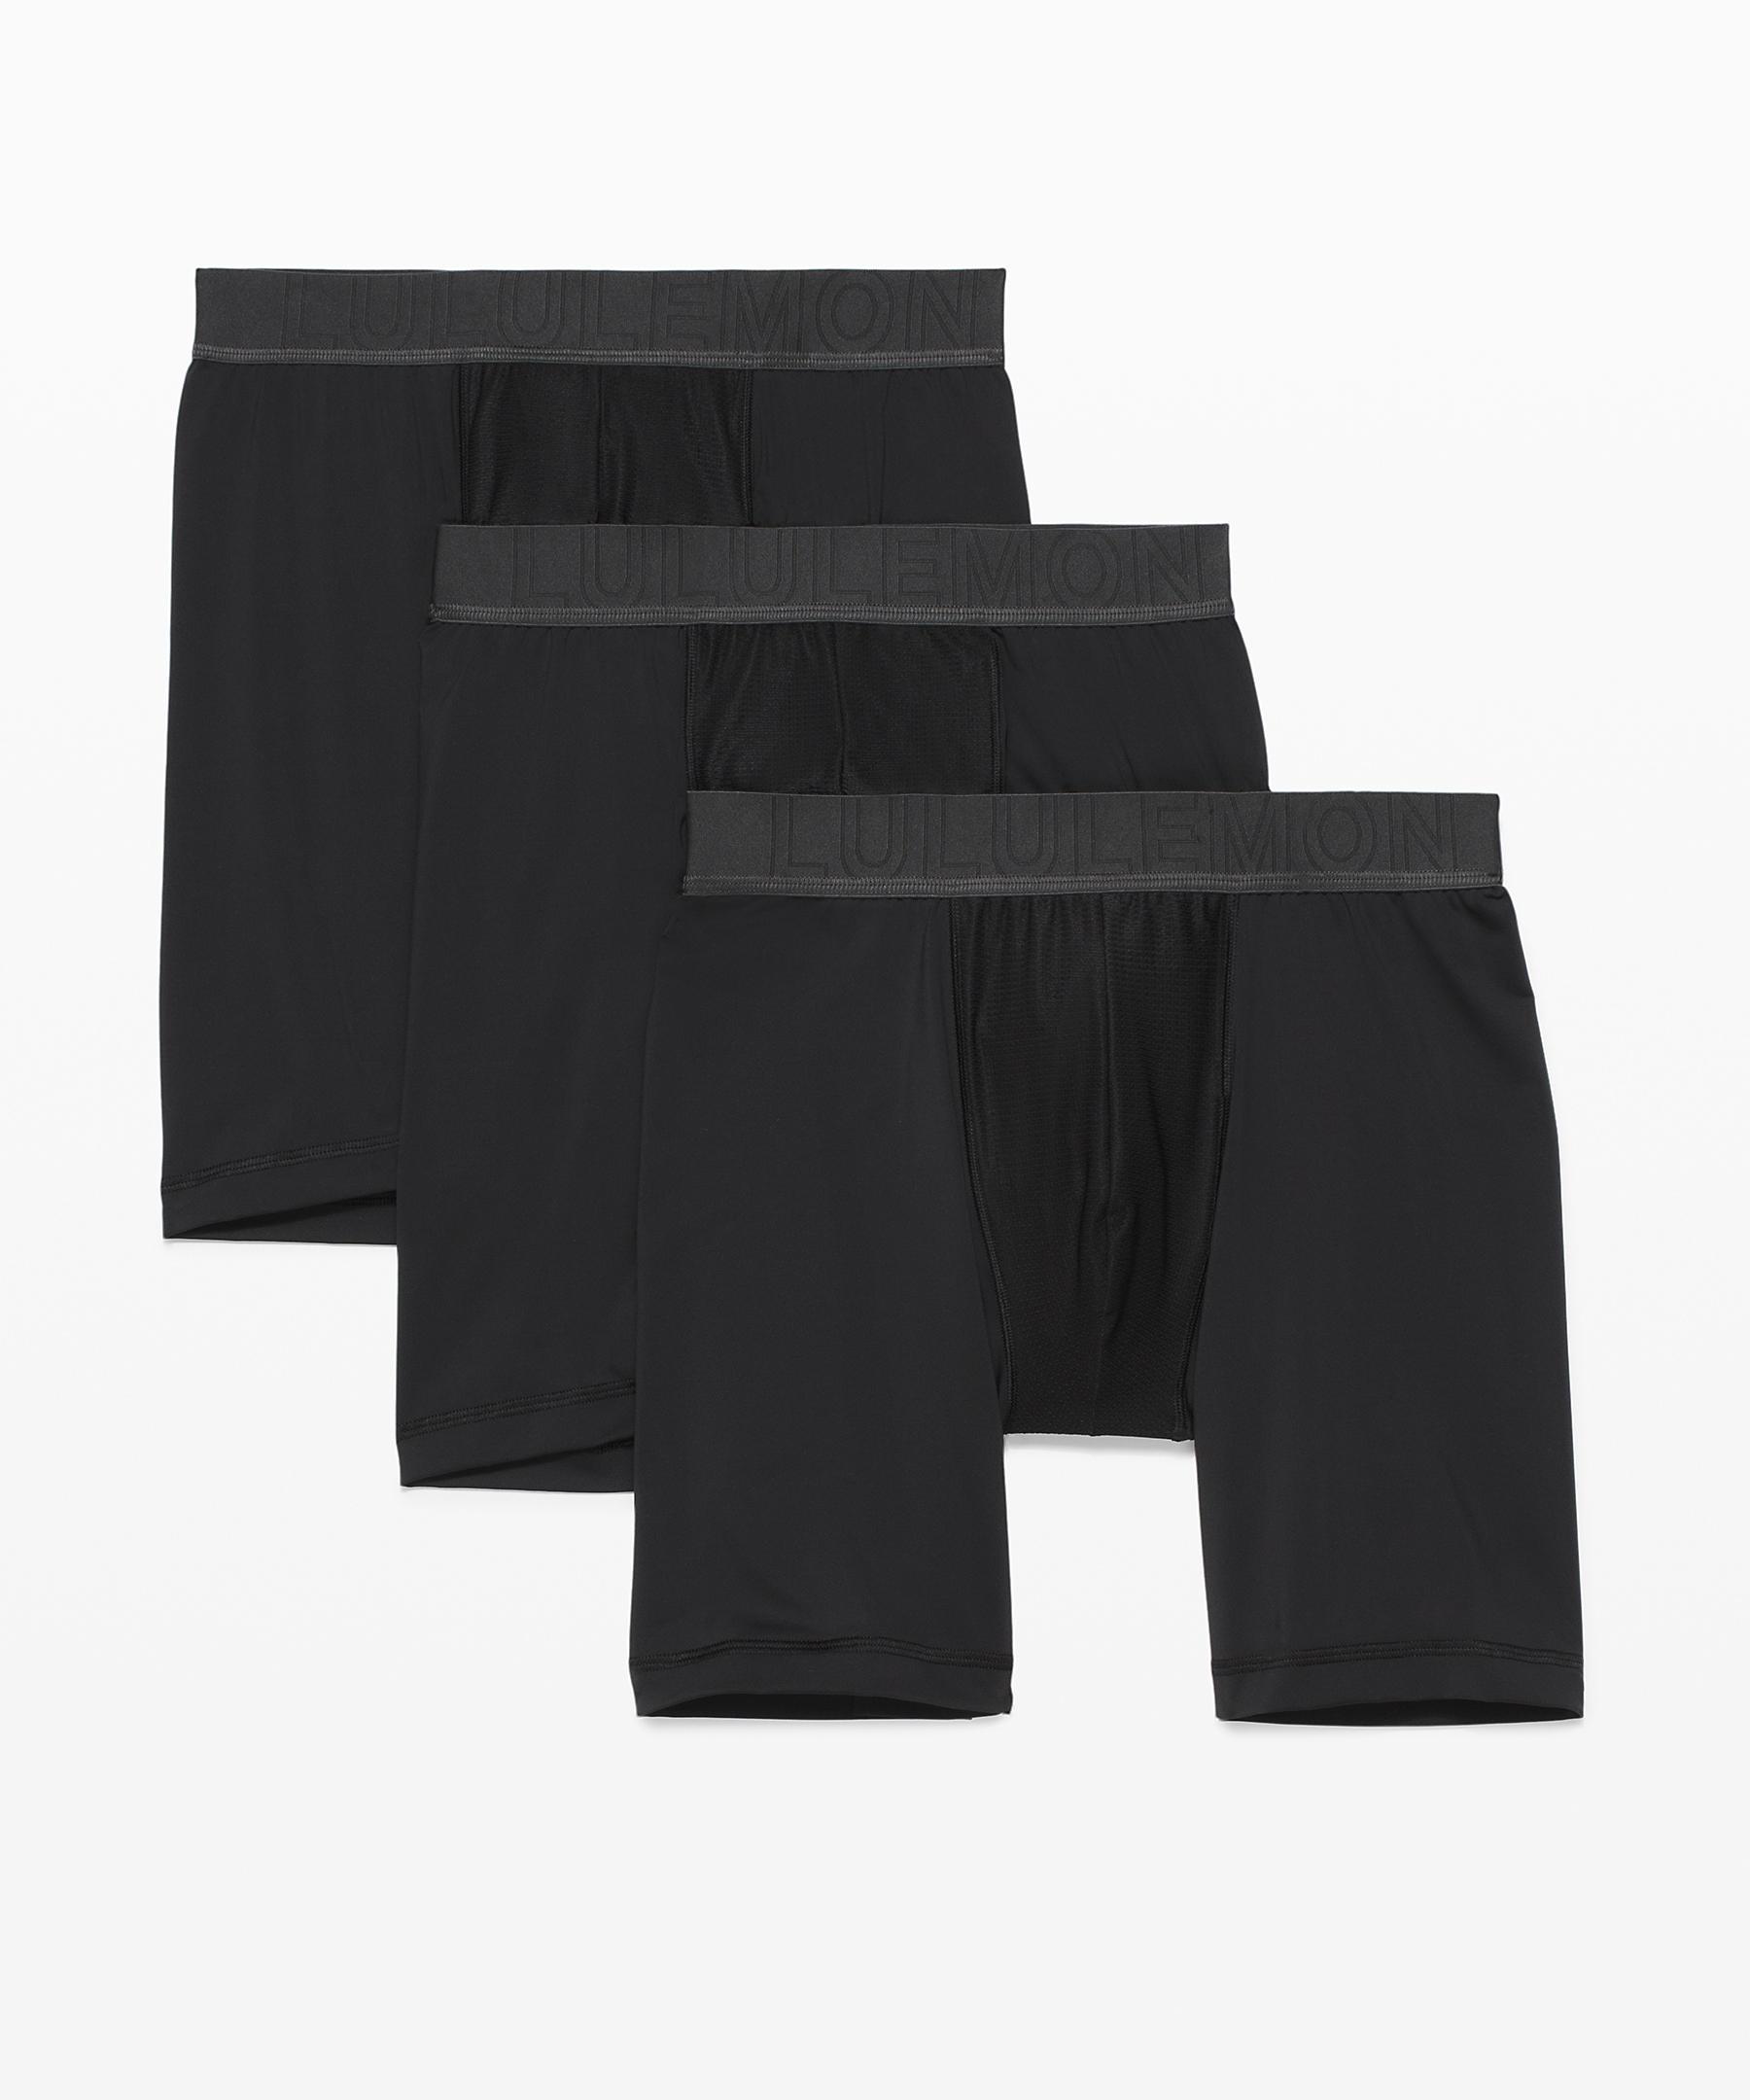 lululemon black friday deals: black spandex boxer briefs